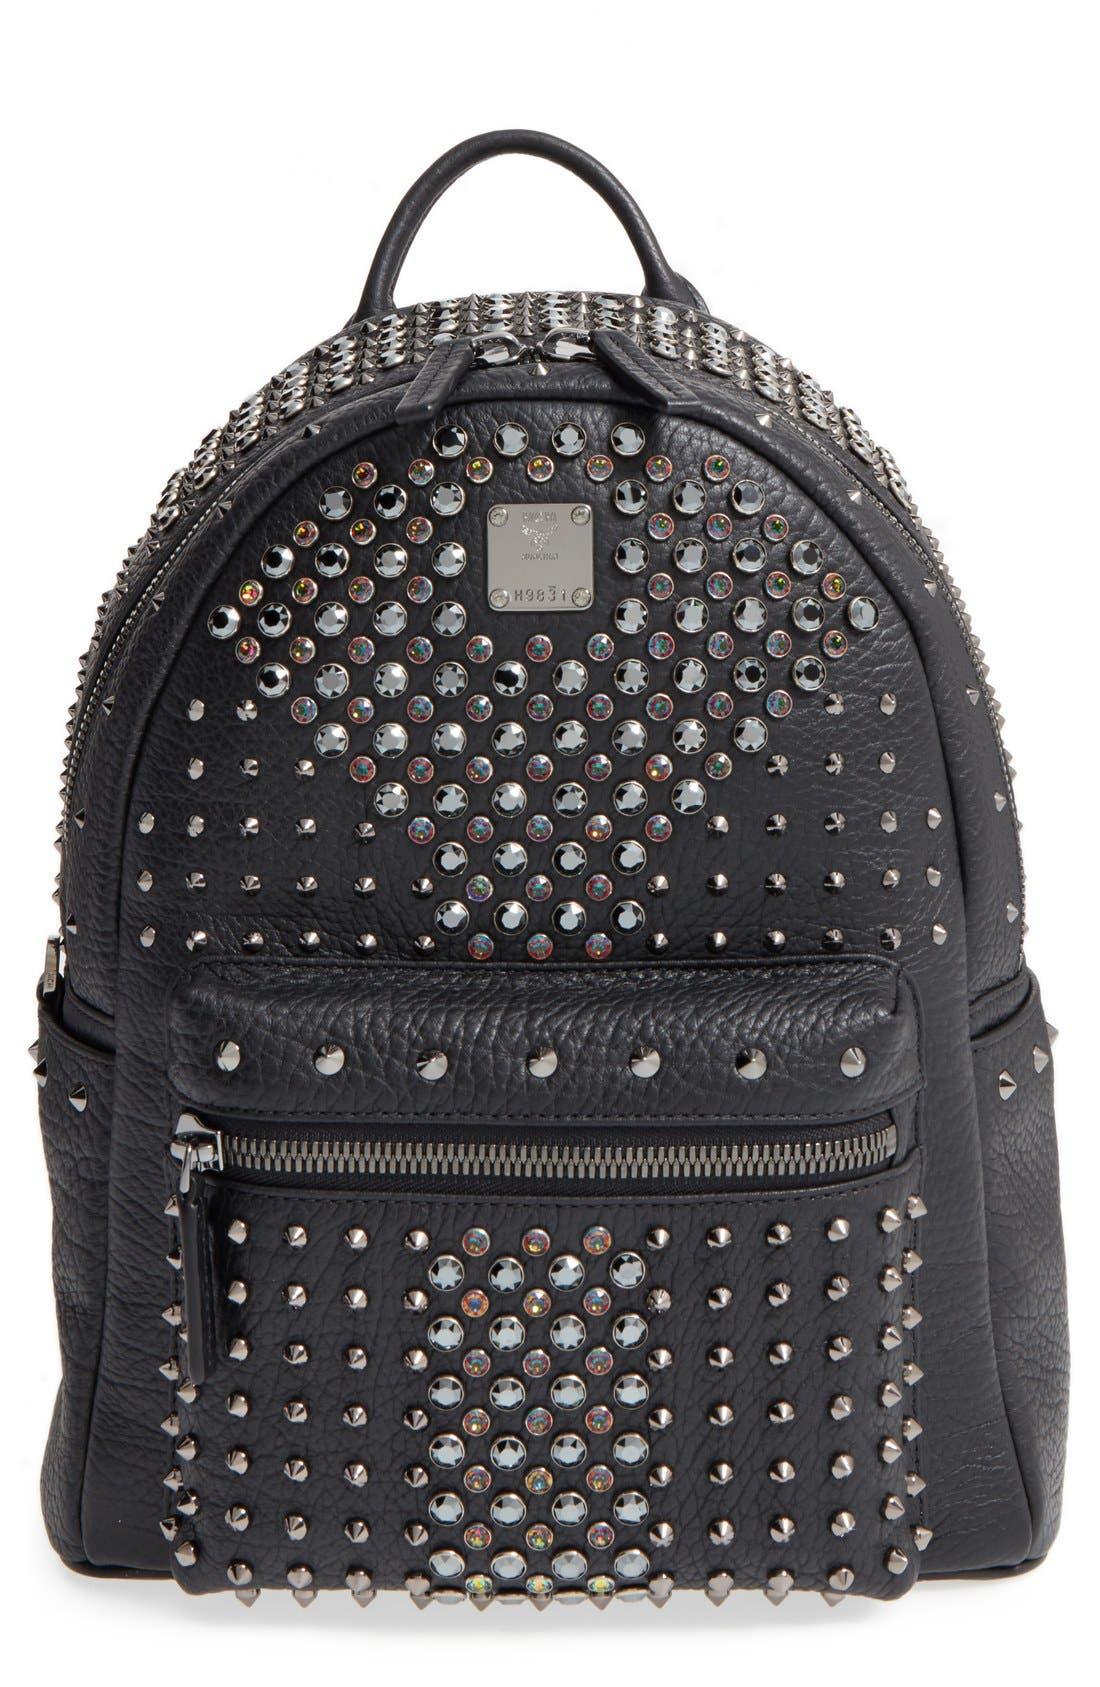 'Small Stark Special' Swarovski Crystal Embellished Leather Backpack, Main, color, 001